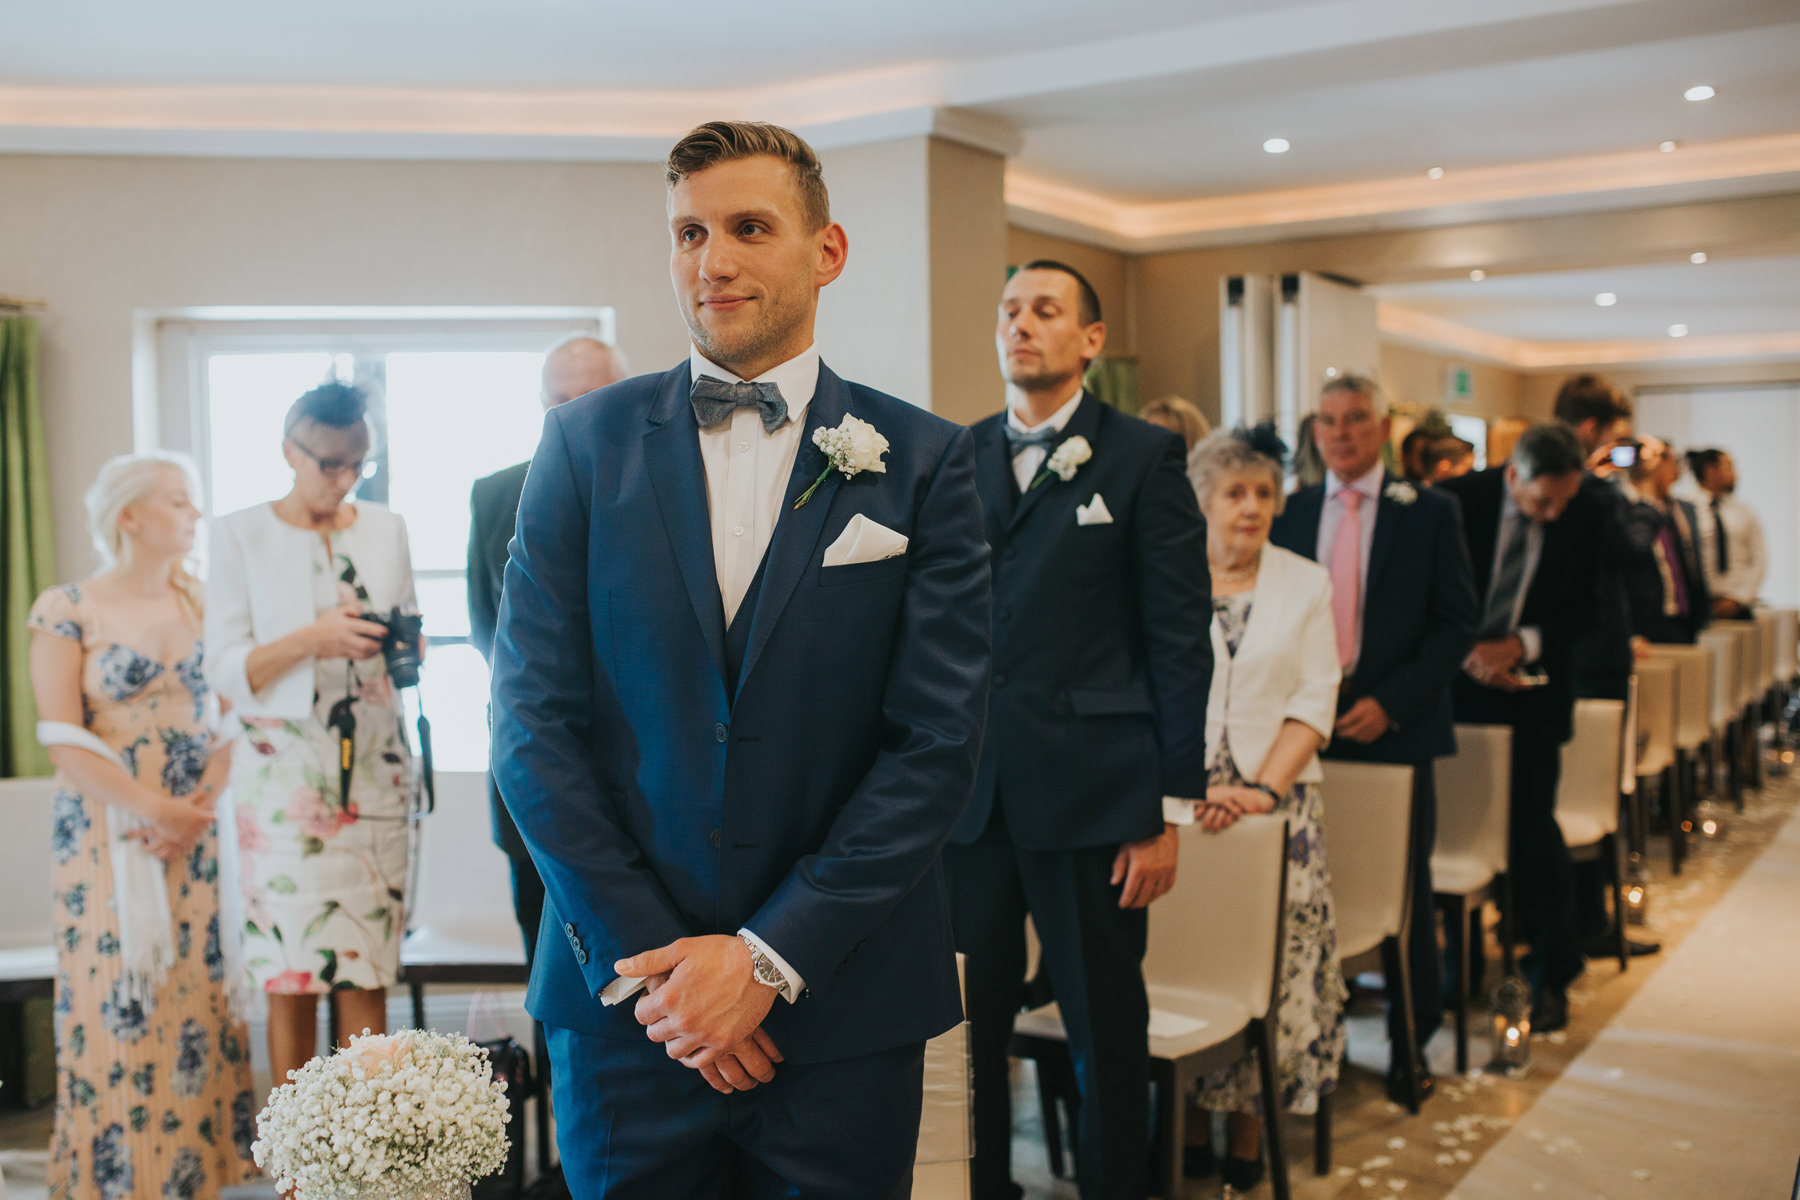 The Bingham Wedding Photographer London--groom waiting bride coming down aisle-CRL-124.jpg